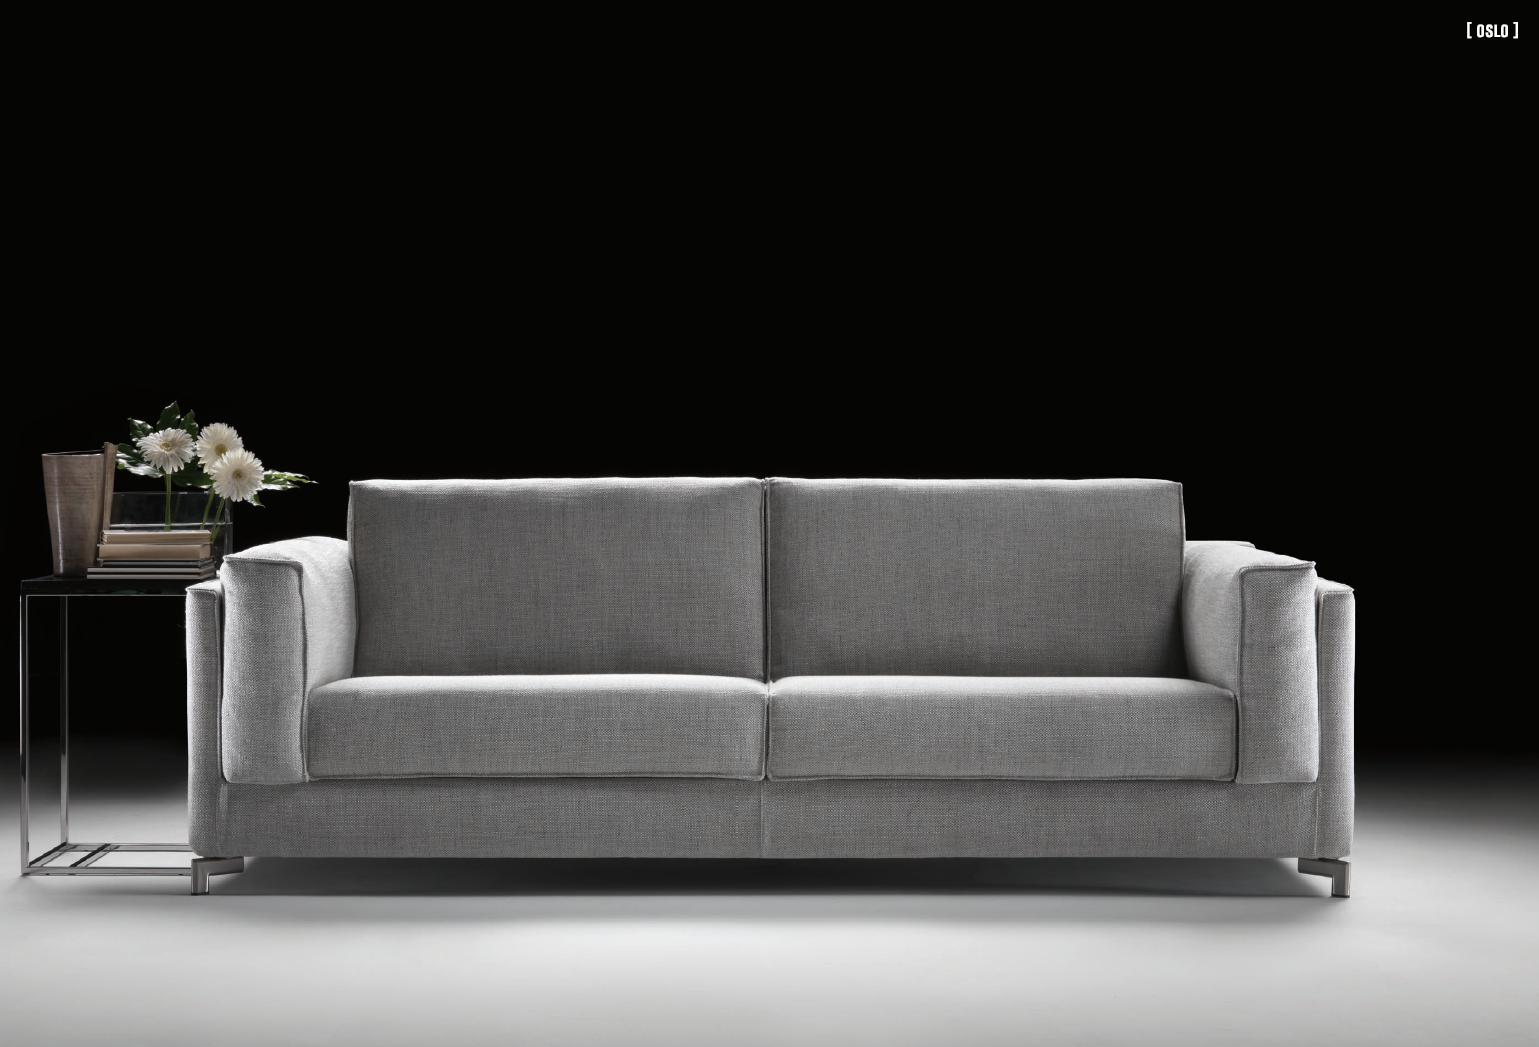 Divano moderno berlin divani moderni salotti divani e for Divani moderni